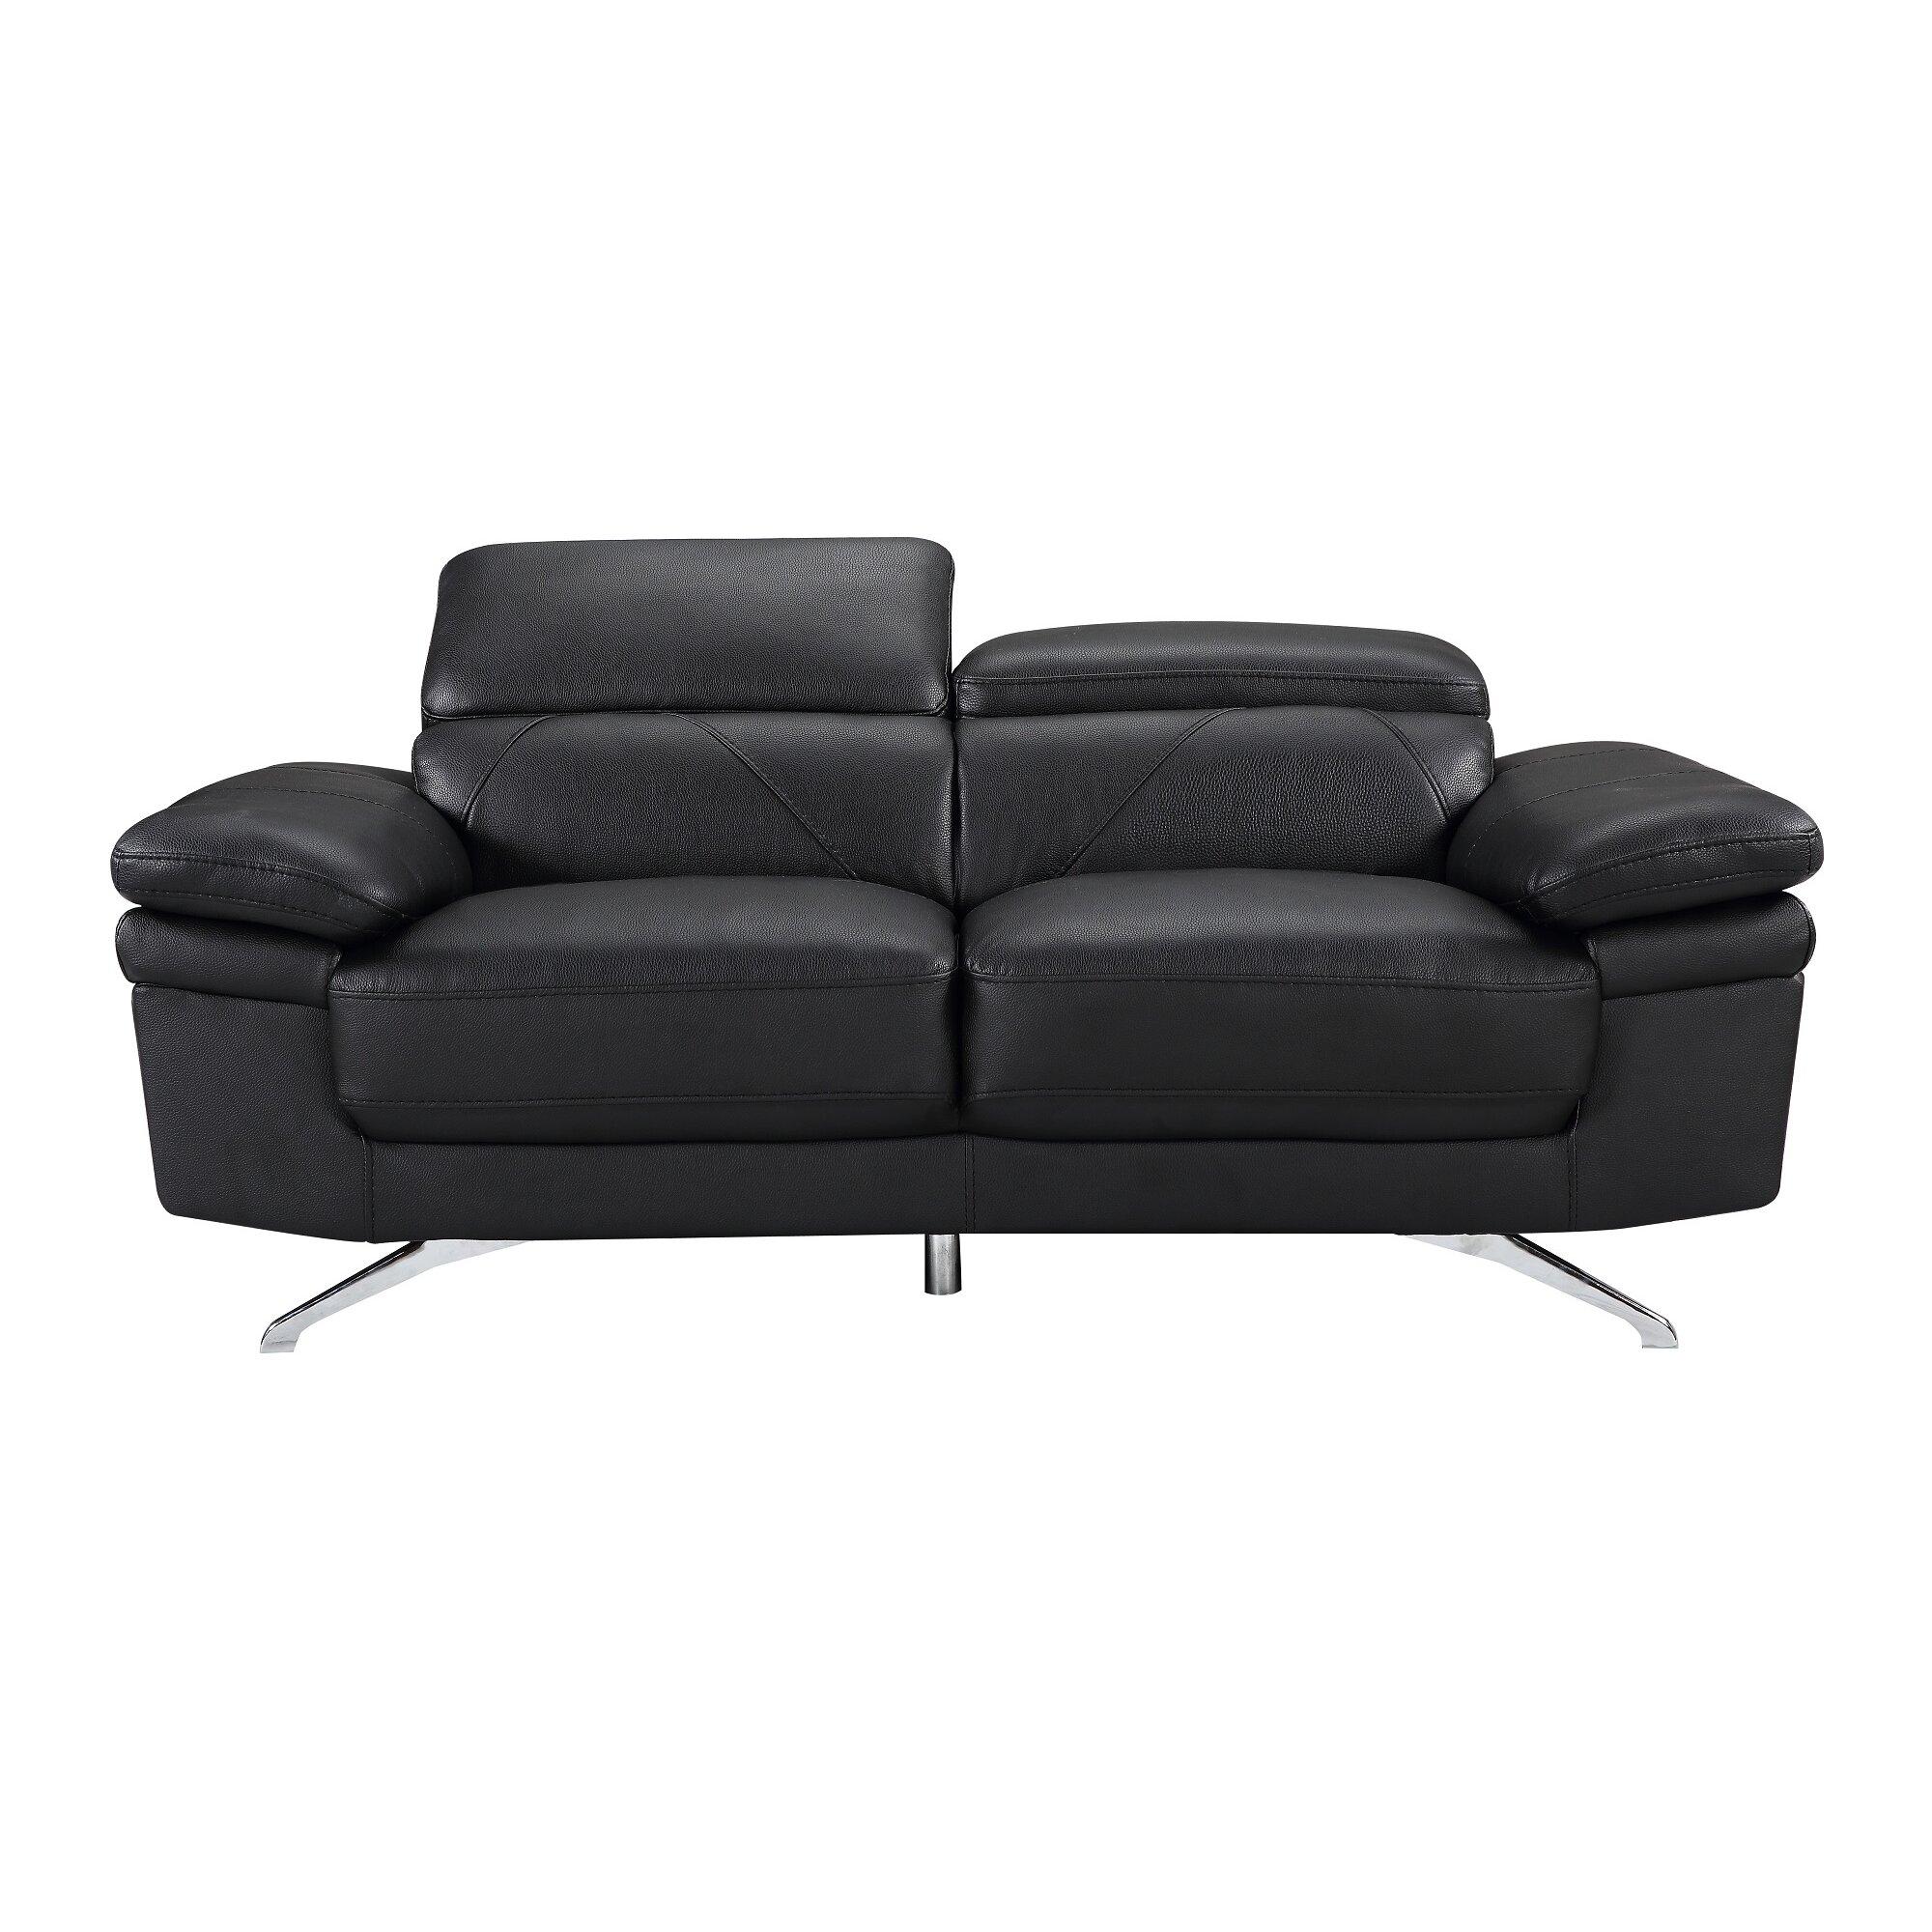 Container 3 Piece Sofa Loveseat Chair Set Wayfair